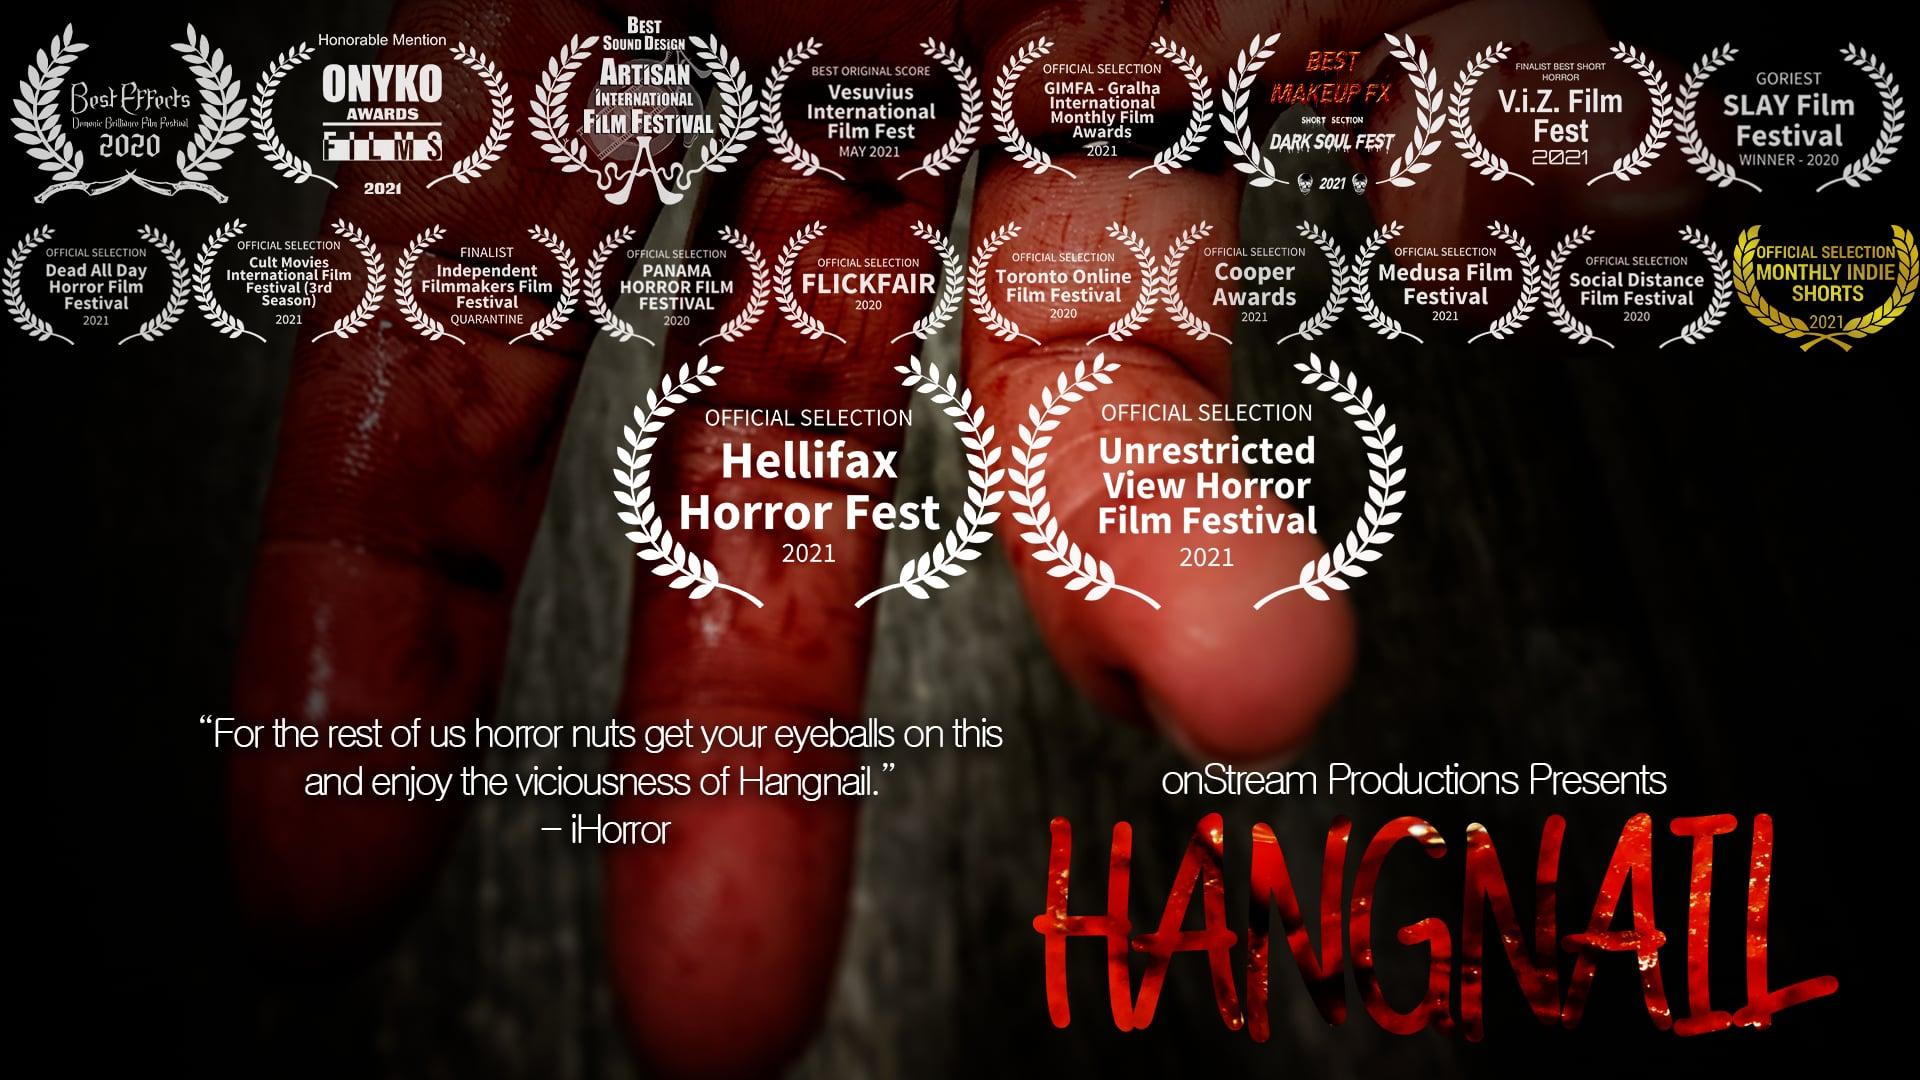 Hangnail   short film directed by Colin MacDonald